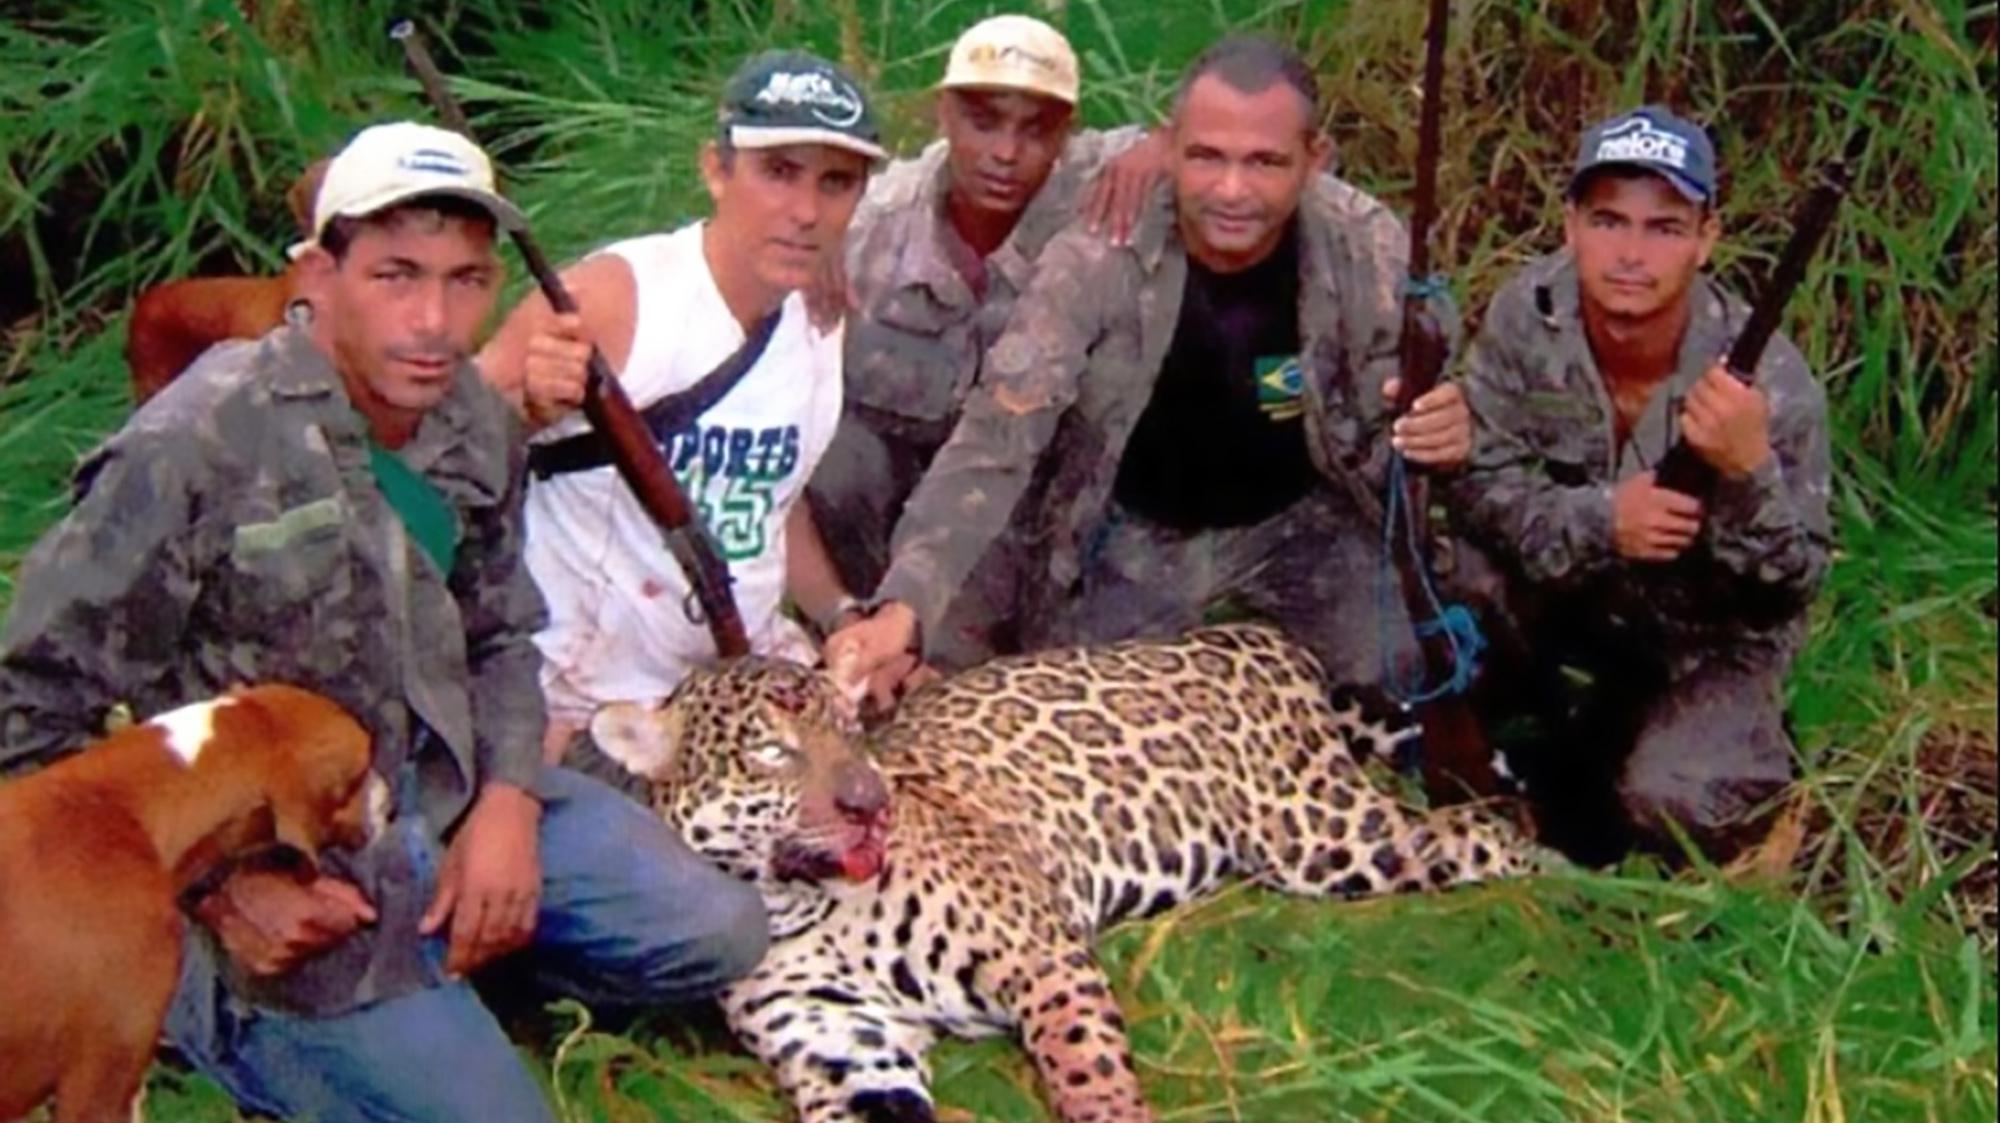 The poachers with a killed jaguar. Credit: CEN